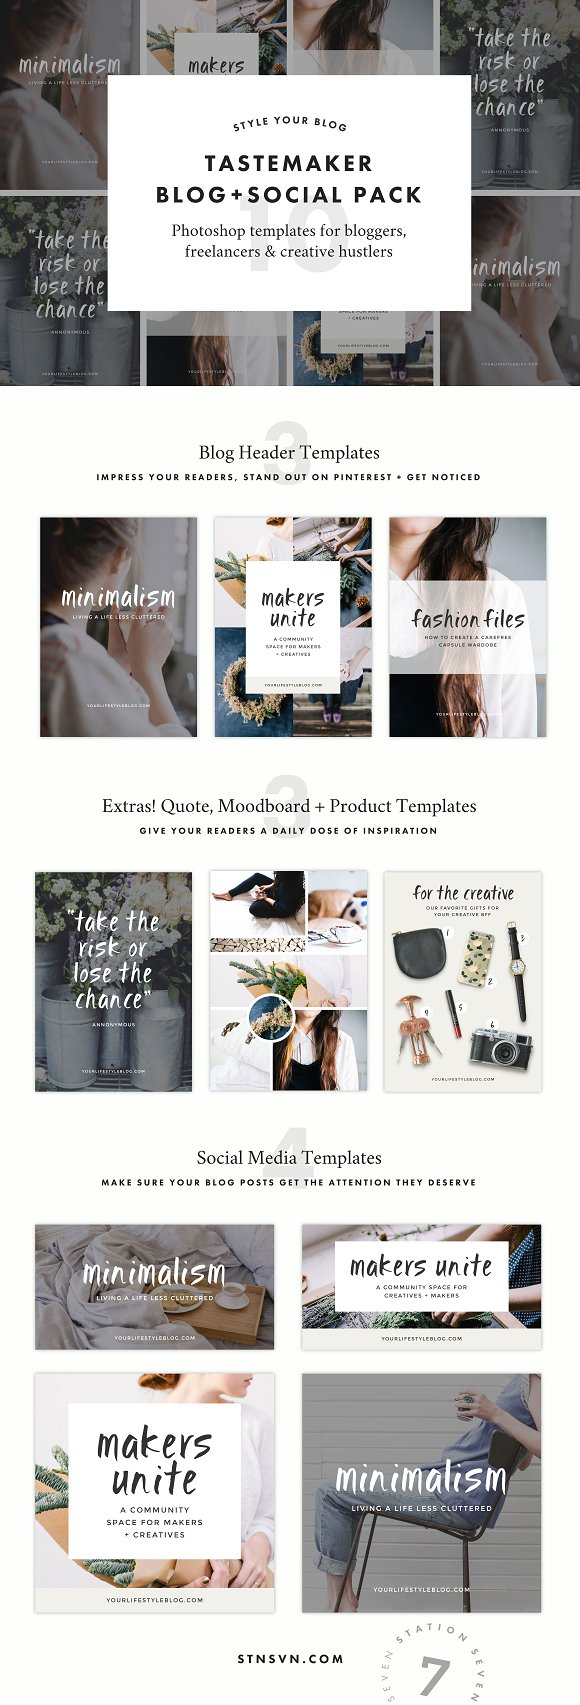 The 10 Best Social Media Templates for Bloggers on Creative Market: tastemaker blog + social media pack by Station Seven